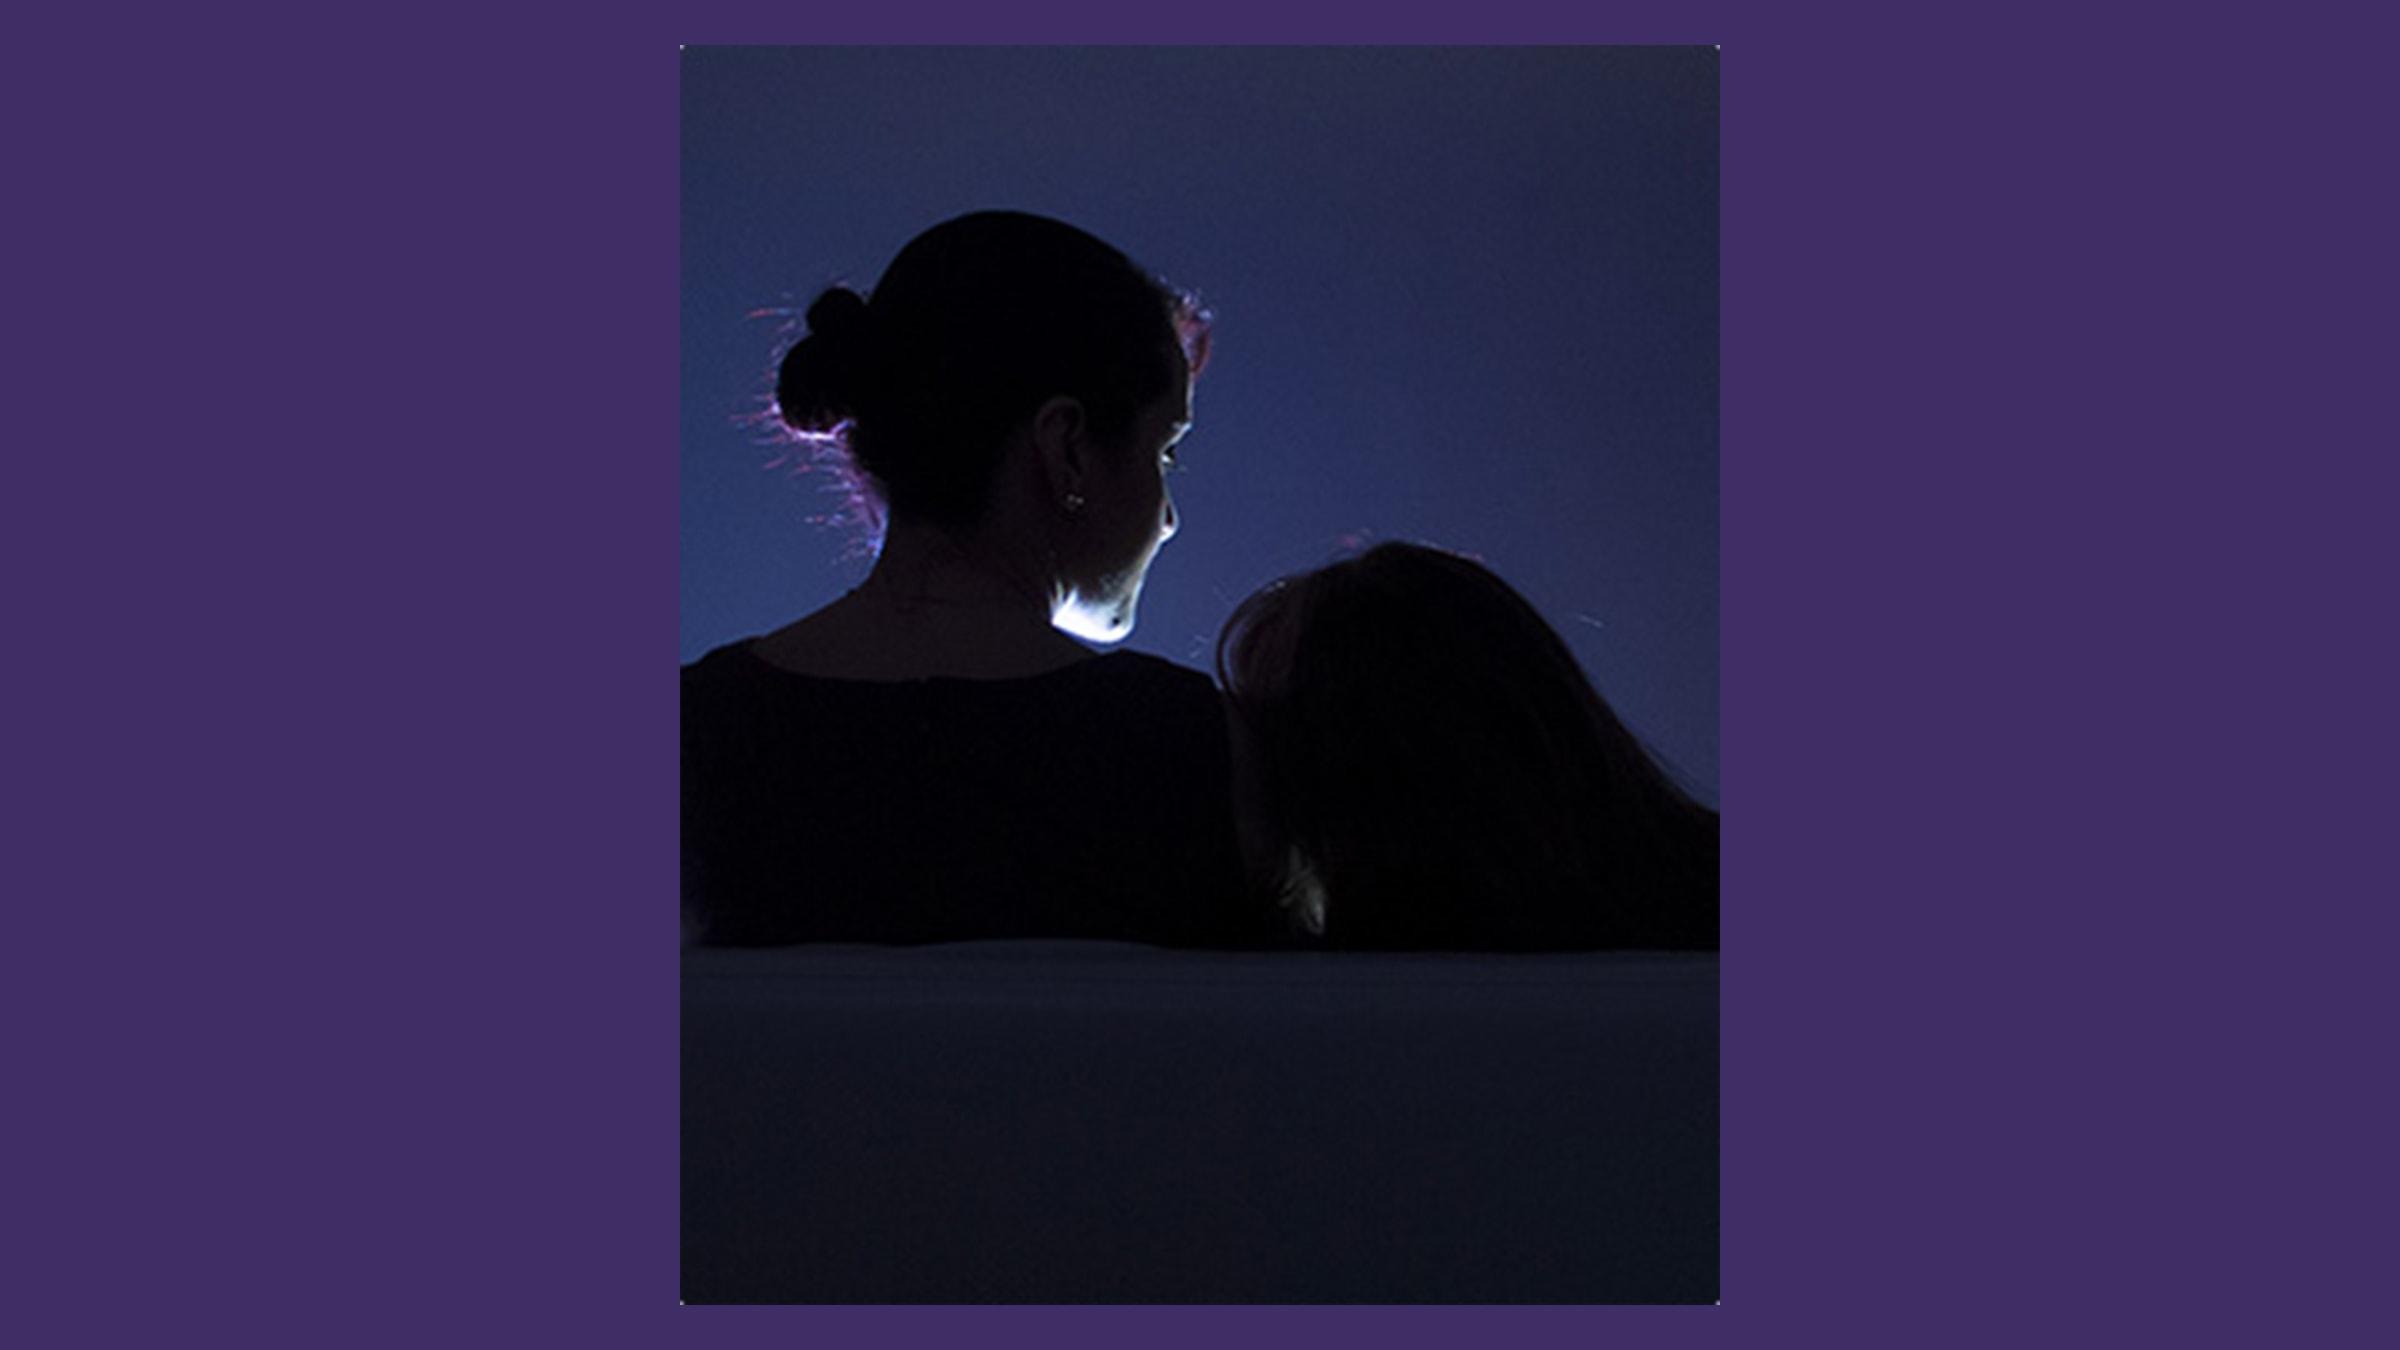 Glitch Film Festivali Seçkisi: Belleğin Azmi